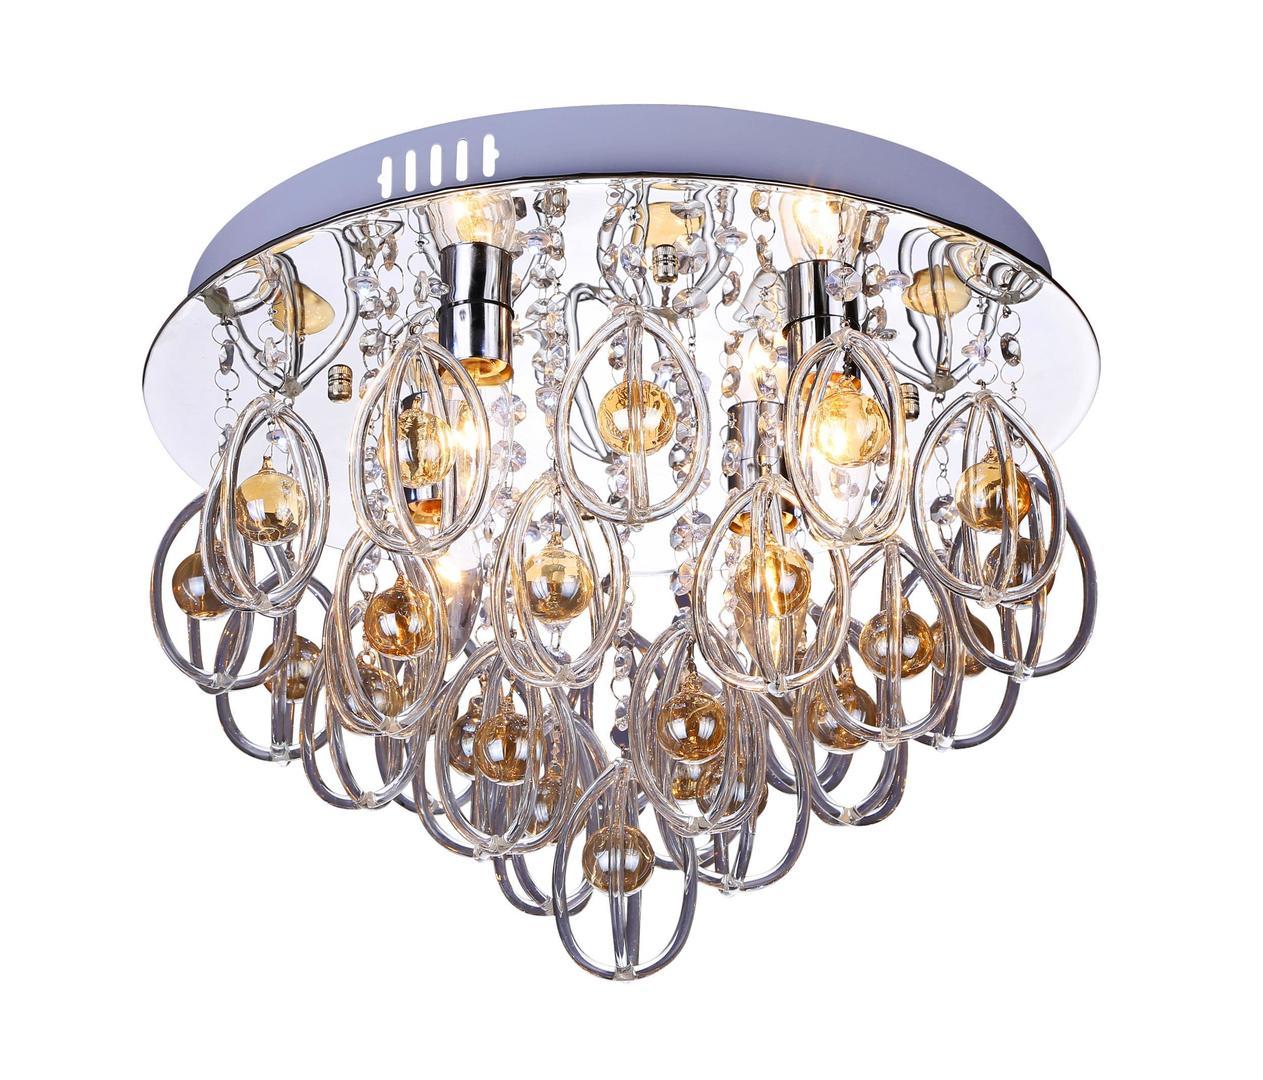 Lampa modernă Ravenna 4 plafon